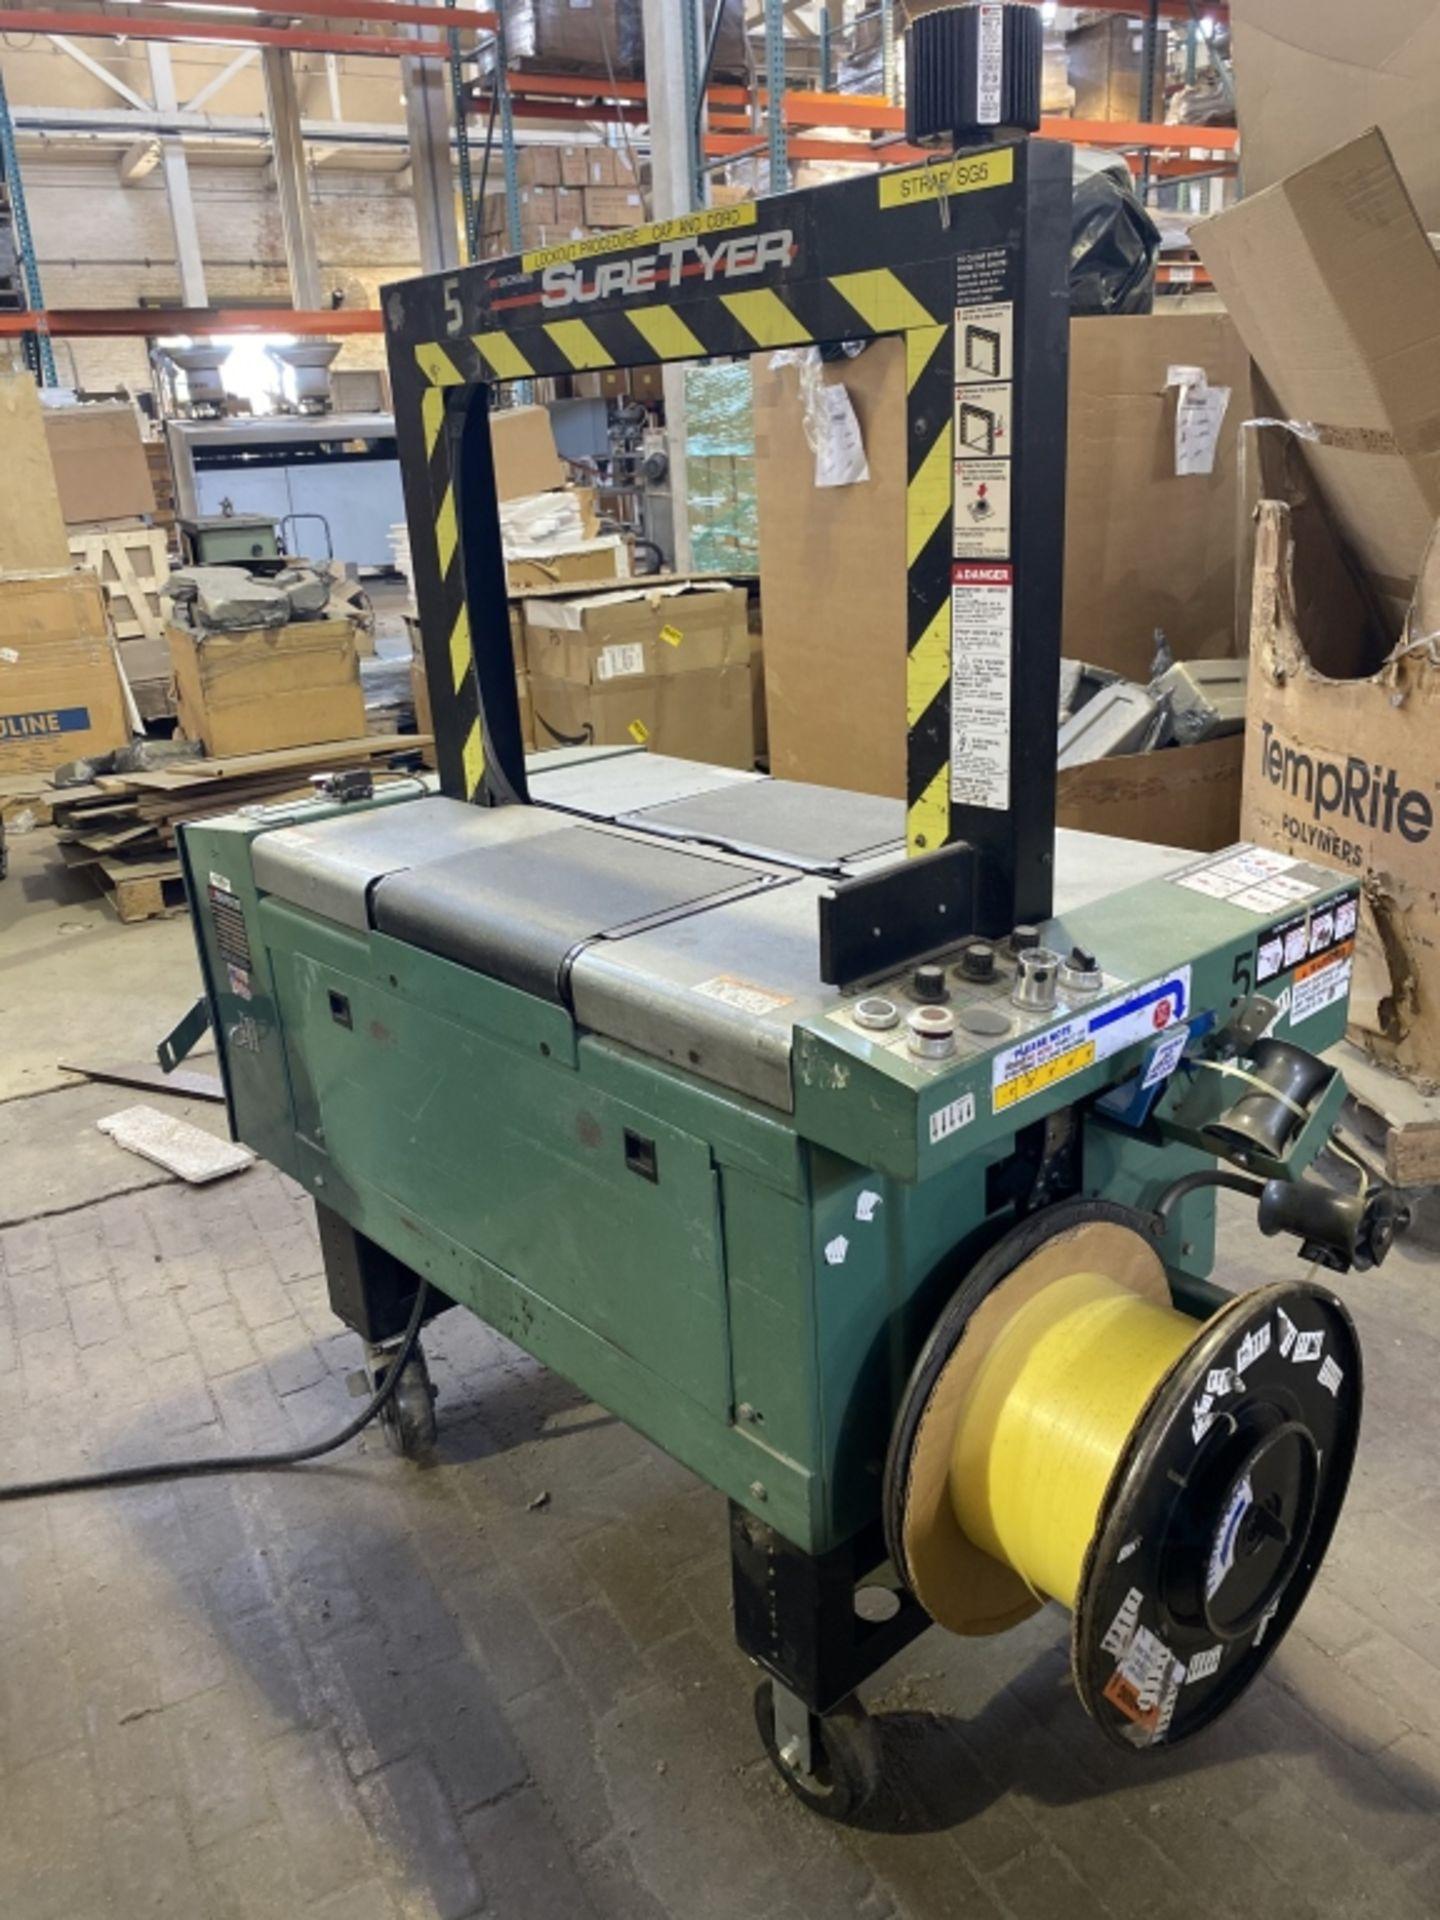 Lot 1034 - Signode Banding Machine Model Sure Tyer